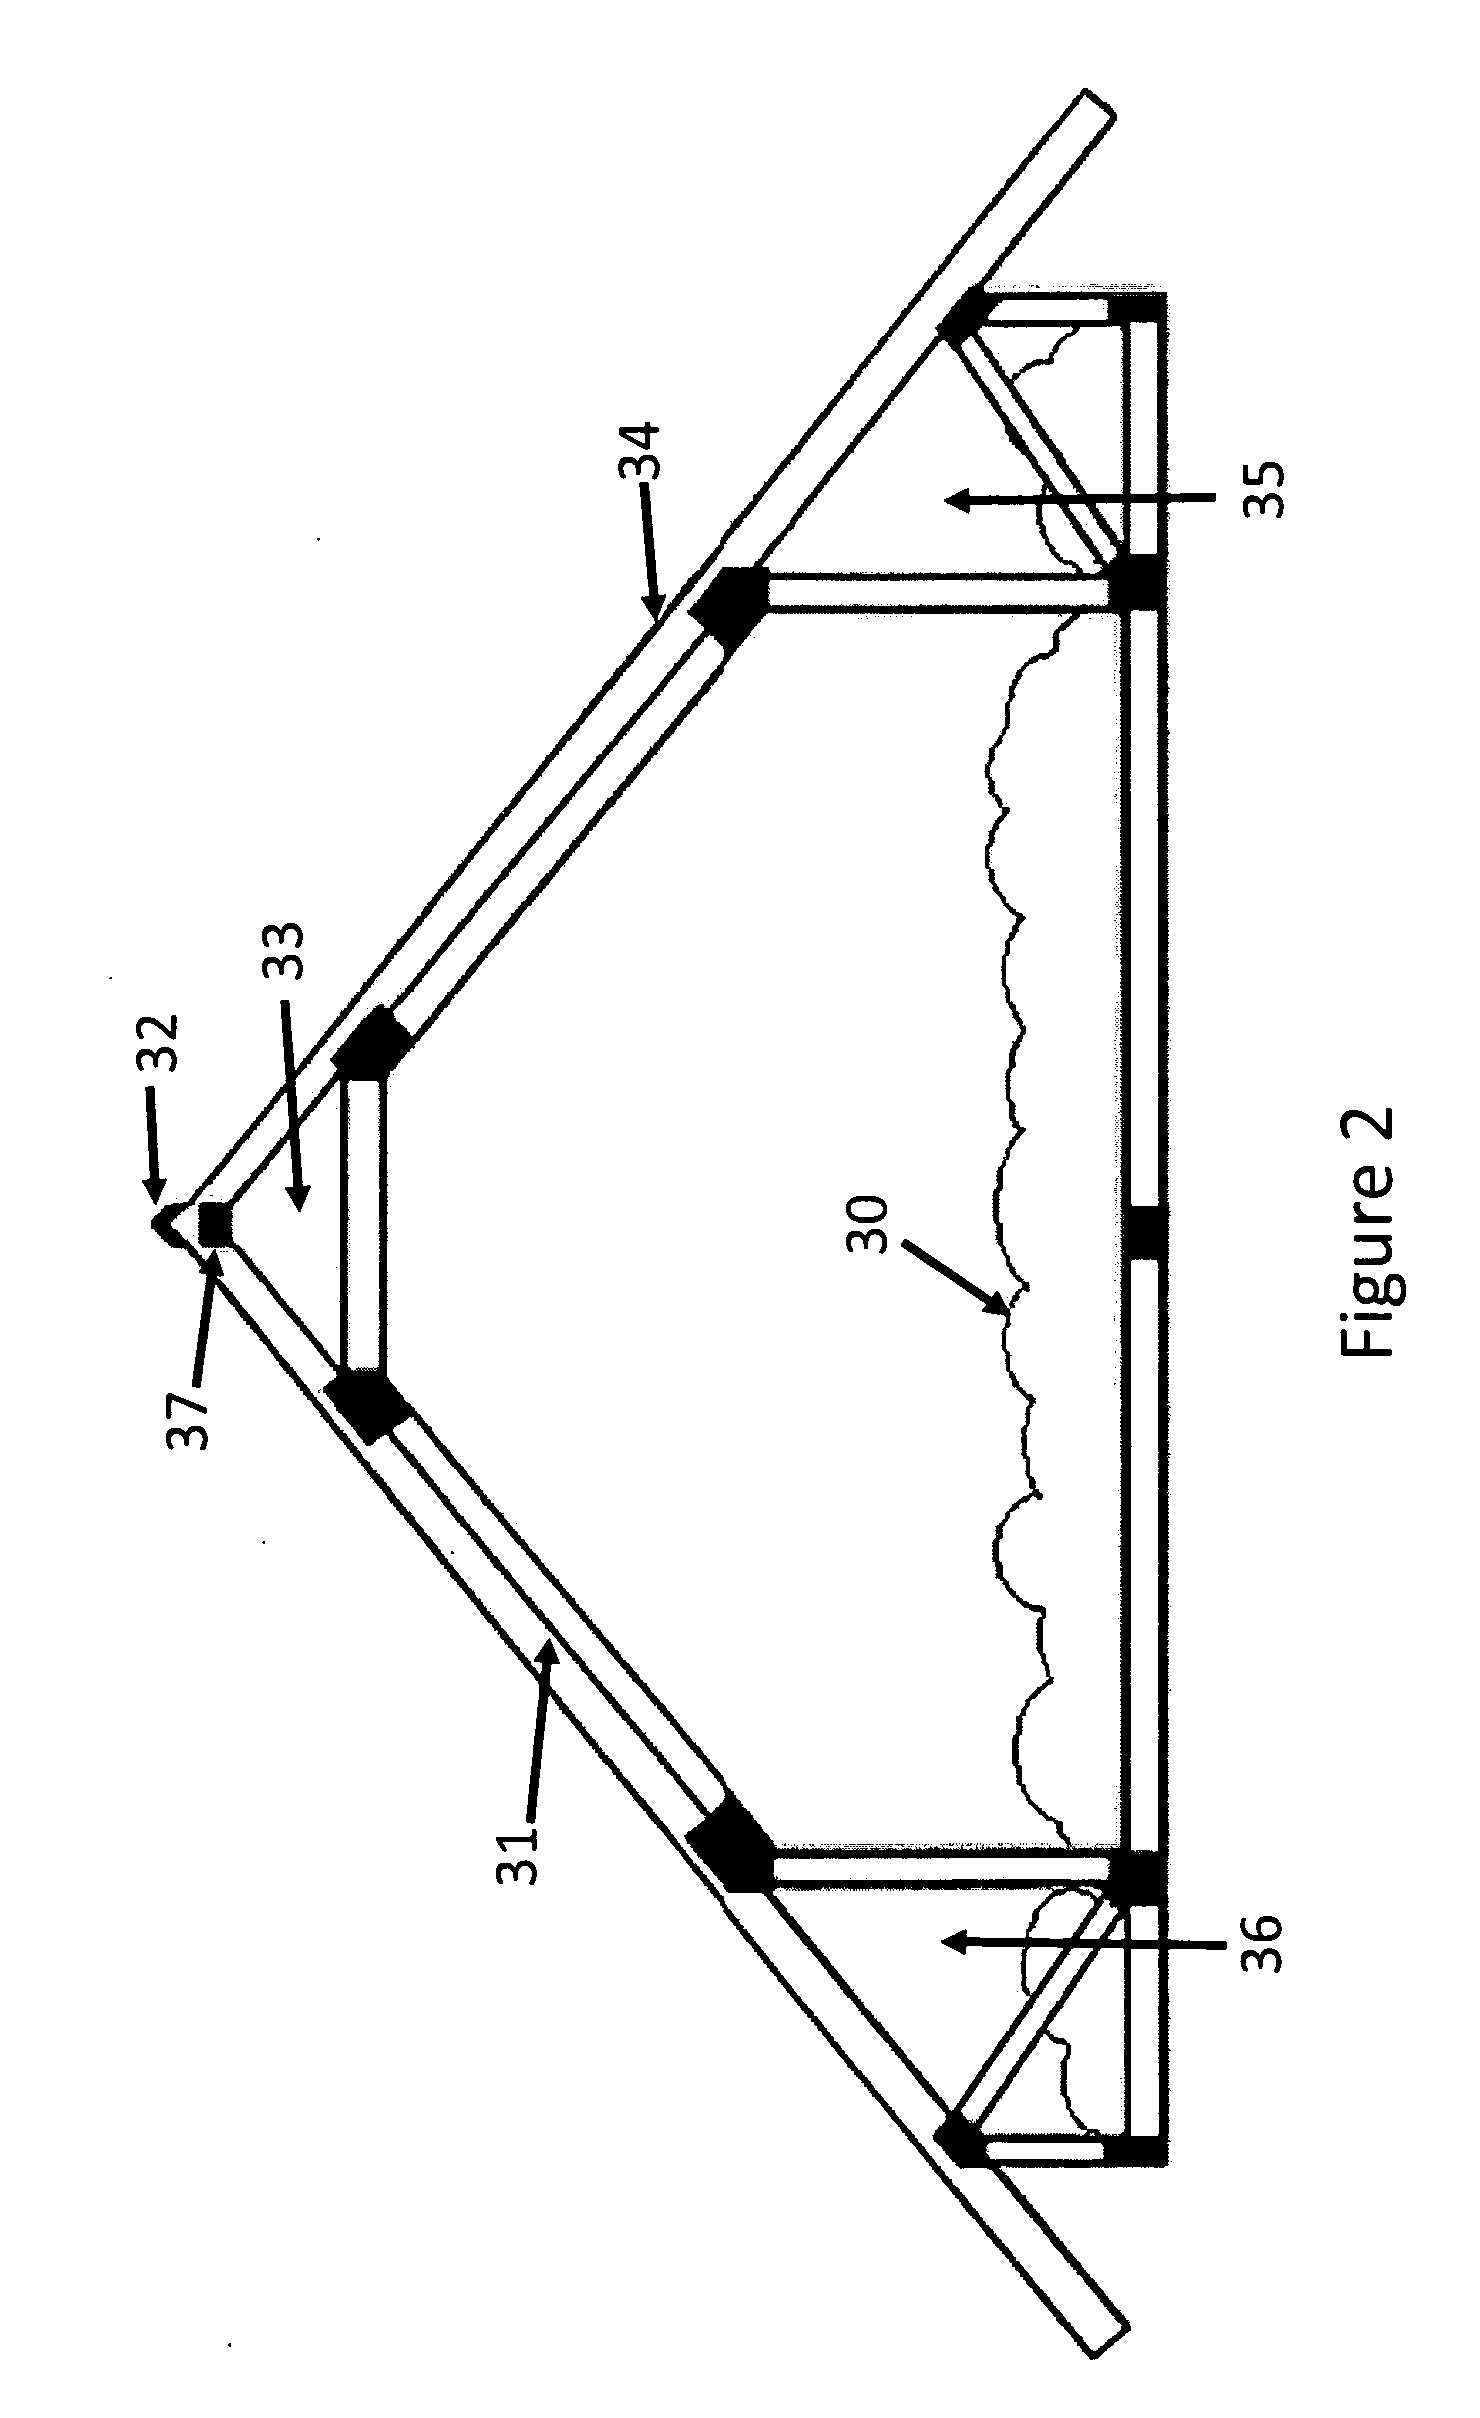 Suzuki Sidekick Parts Diagram Manifold Suzuki Auto